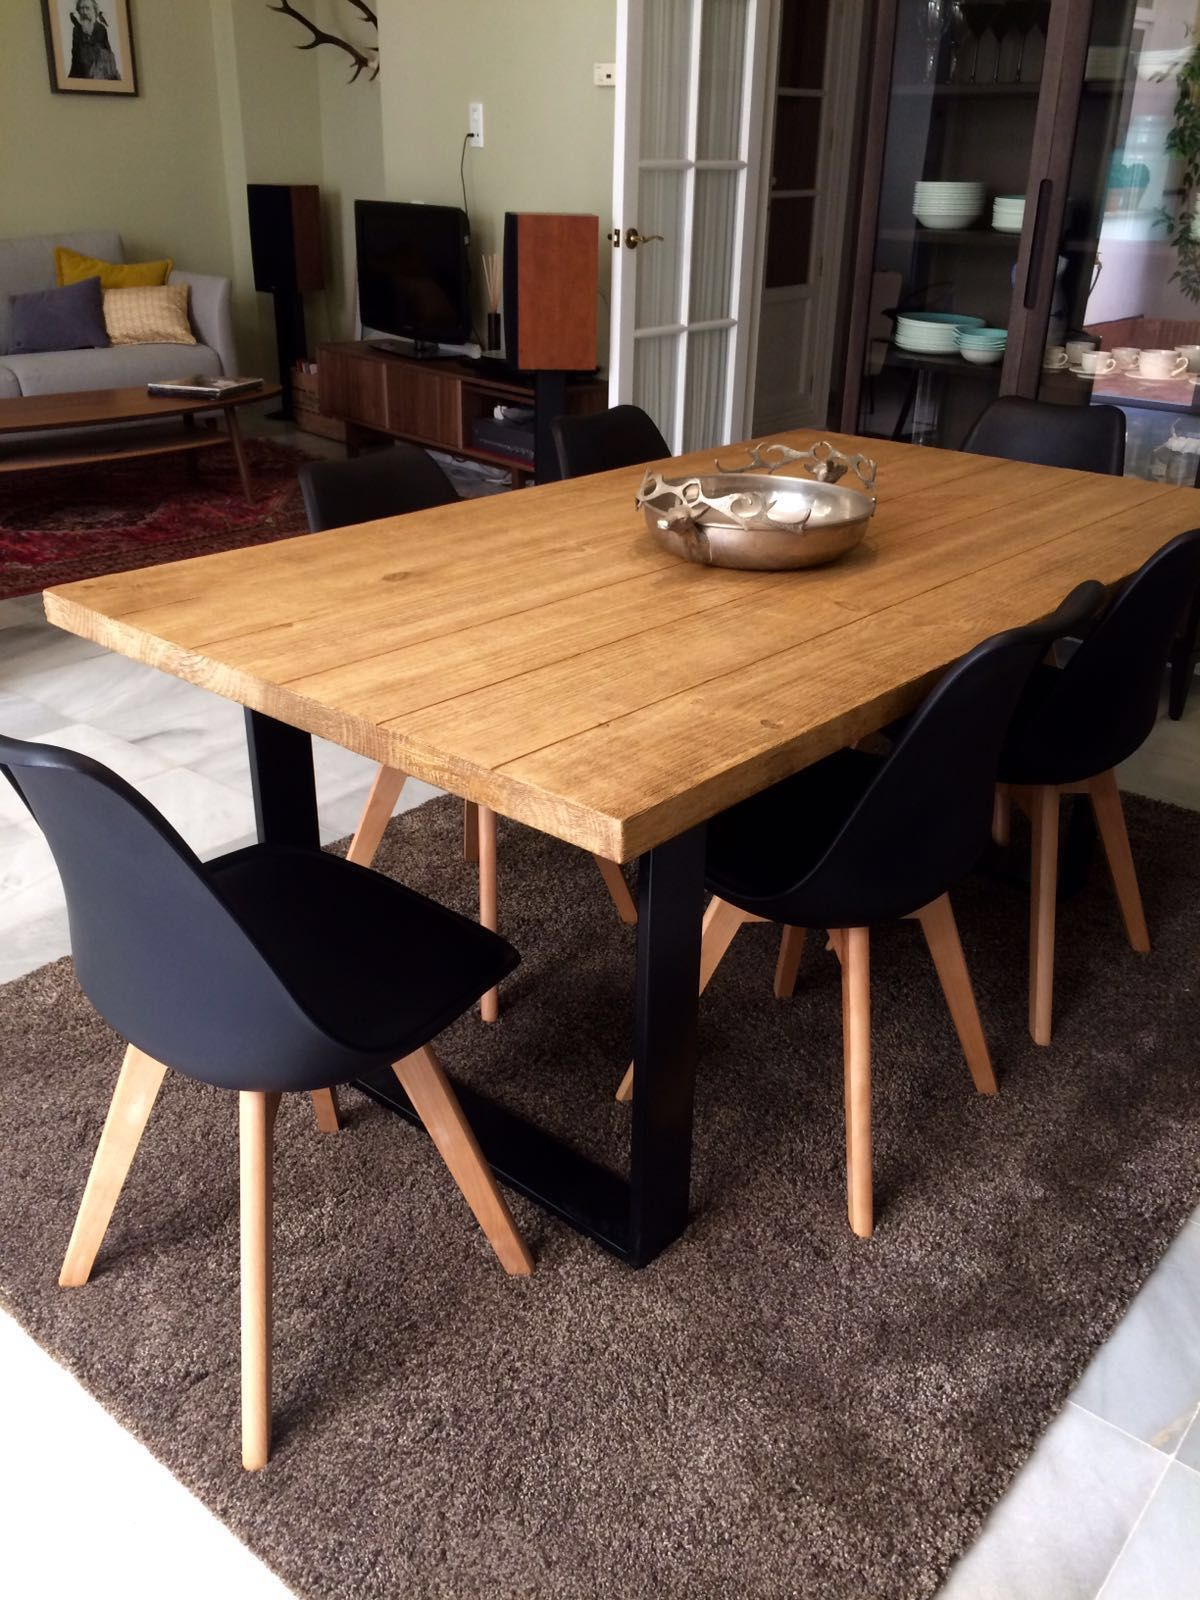 Mesa de comedor industrial en 2019 mesa de comedor - Mesa de comedor ...